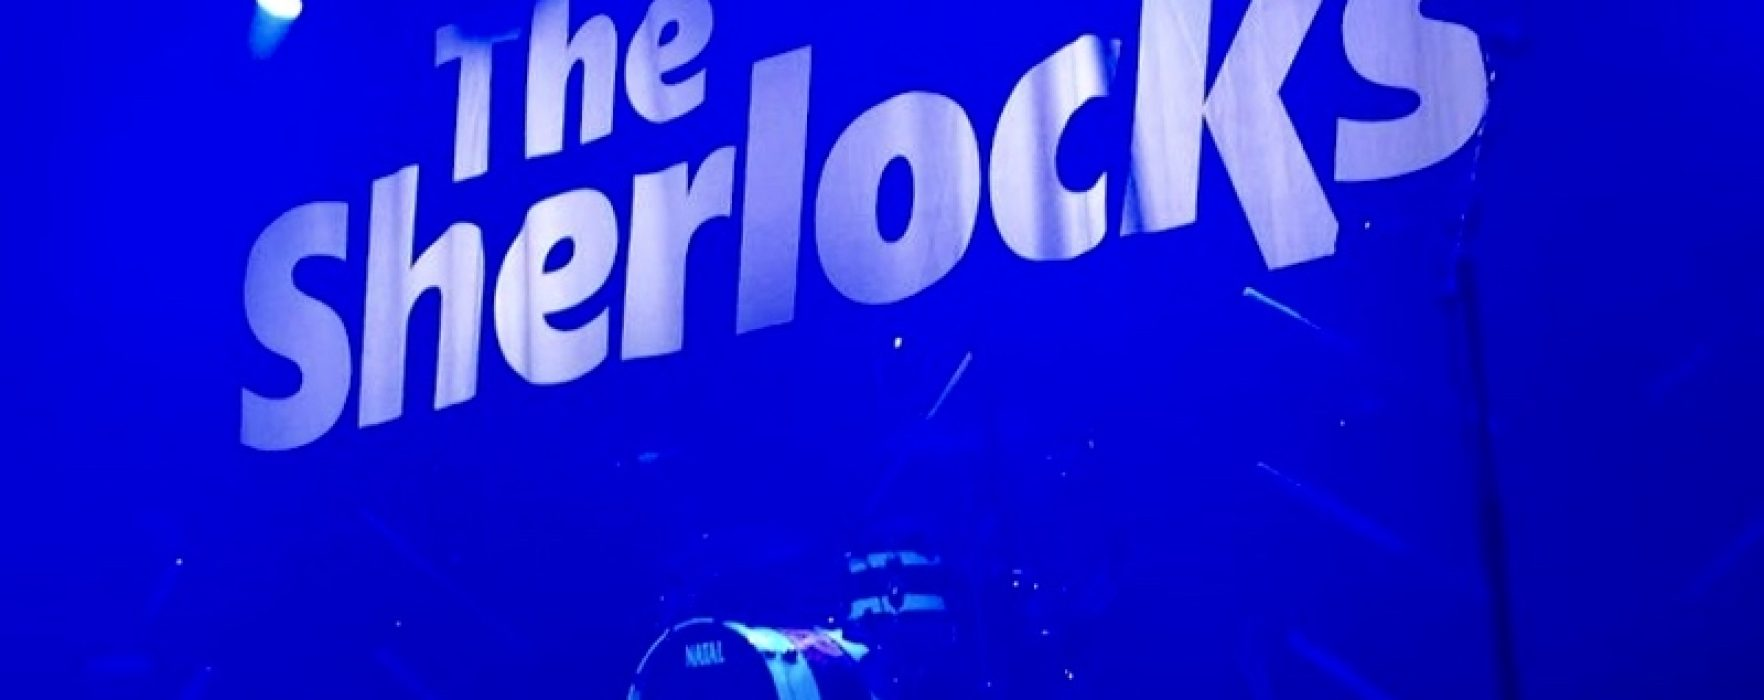 The Sherlocks nail their biggest headliner to date!